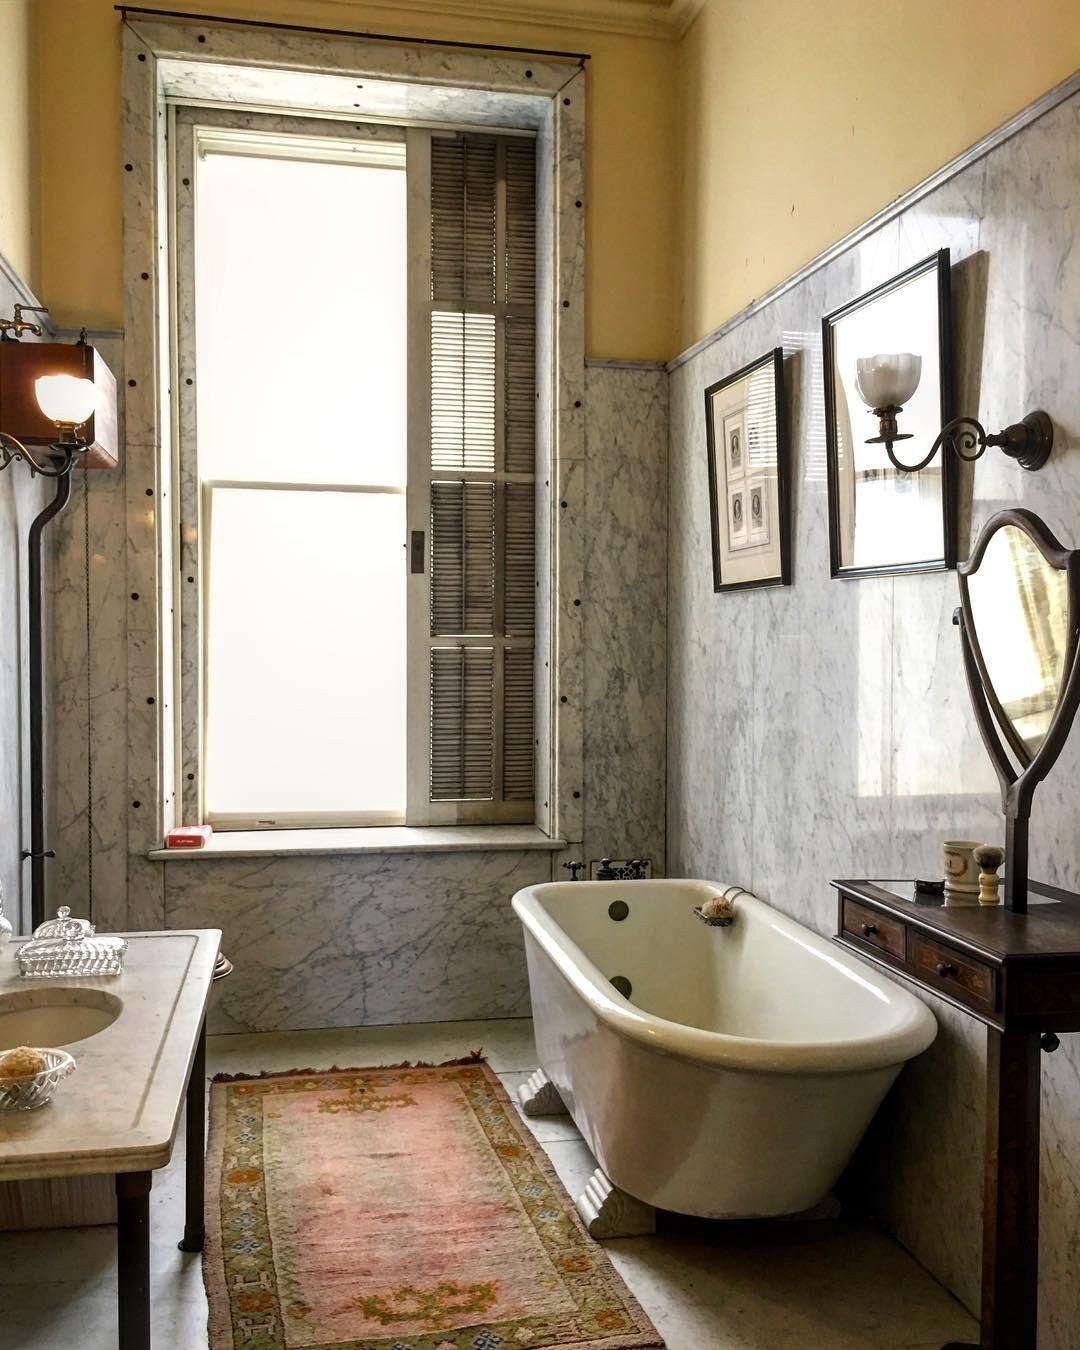 Conservatory Room Addition In The Uk 1040x1485 In 2020: May 27th 2017 🙌🏽 #tbt #vintagebathroom #lostintime #gildedage #belleepoque #millsmansio